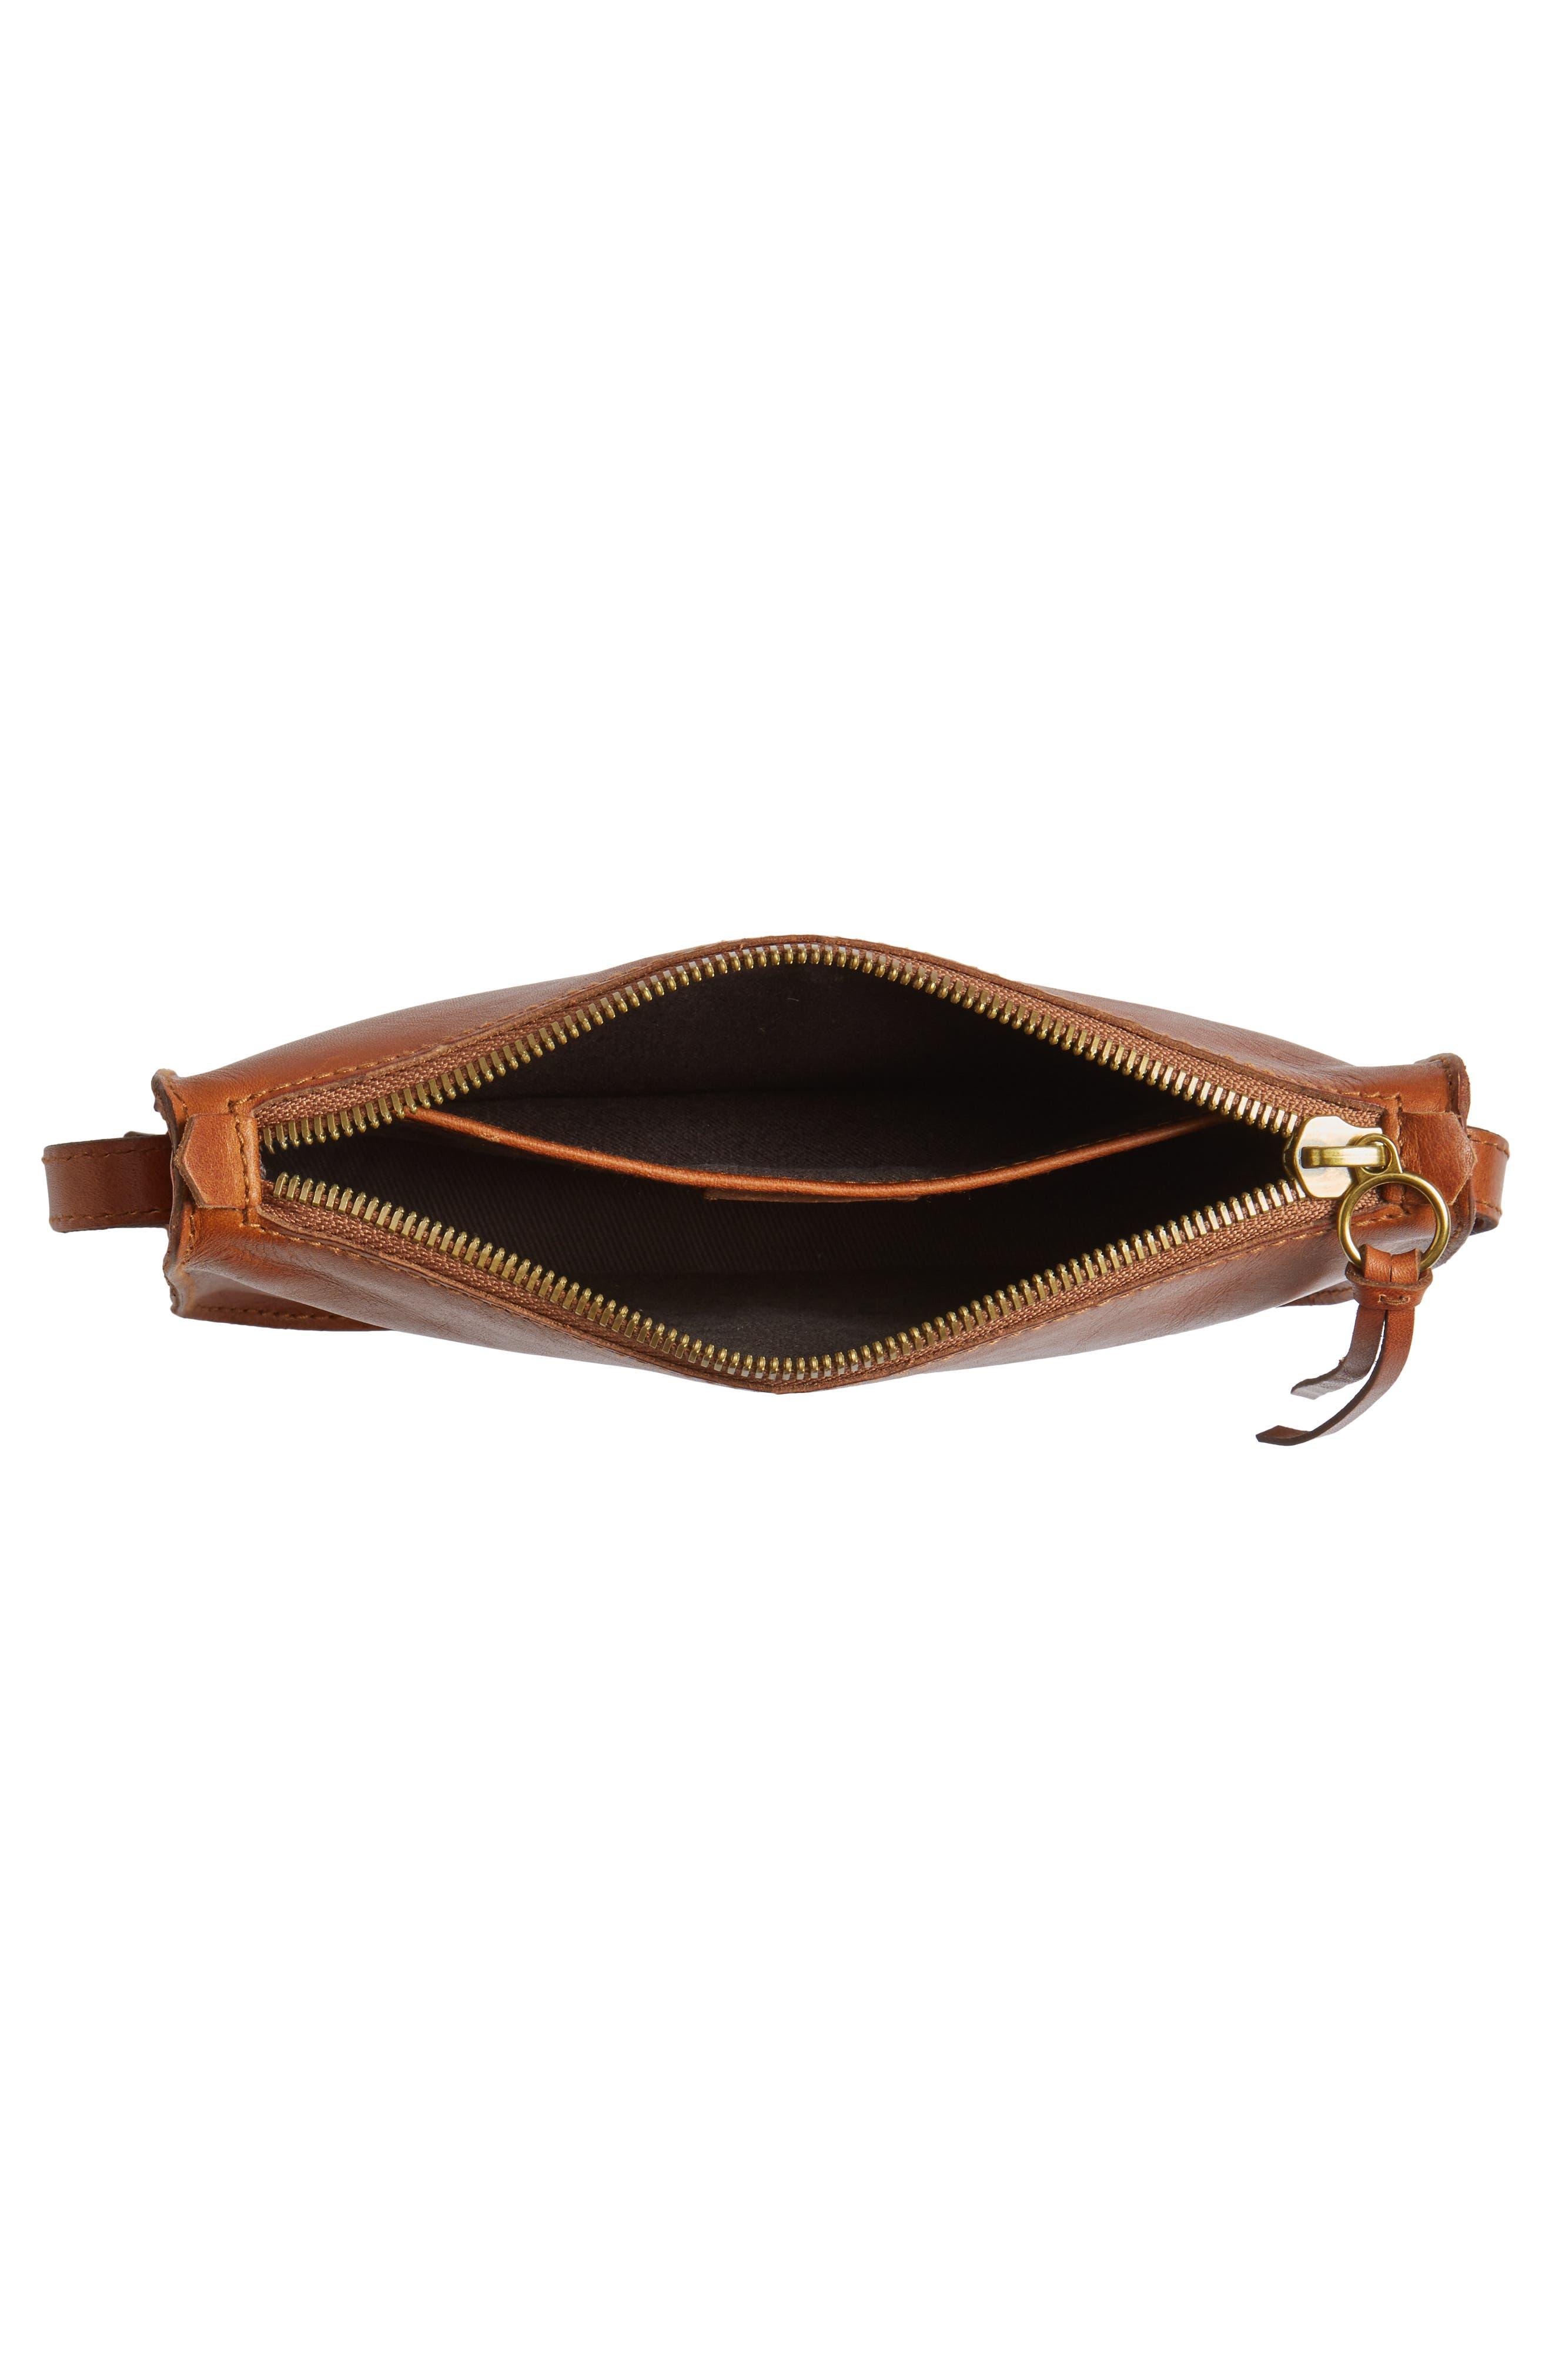 The Simple Leather Crossbody Bag,                             Alternate thumbnail 4, color,                             ENGLISH SADDLE